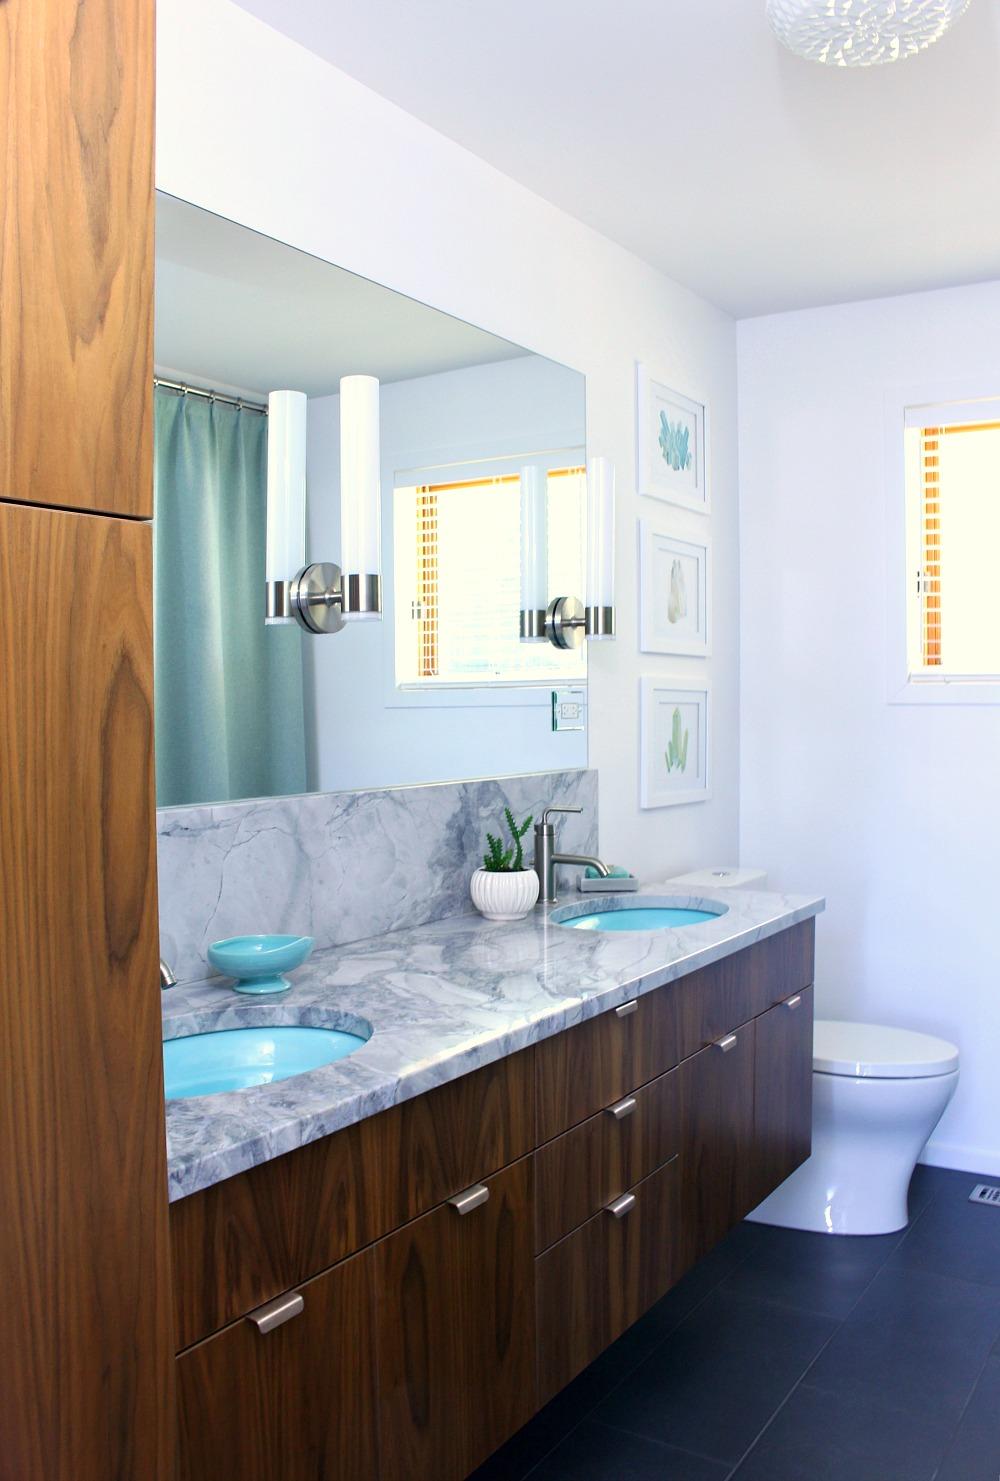 Mid-Century Modern Inspired Bathroom Renovation, Before + After - Floating Walnut Vanity, Quartzite Counters, Kohler Purist Fixtures, Aqua Sinks - from www.danslelakehouse.com